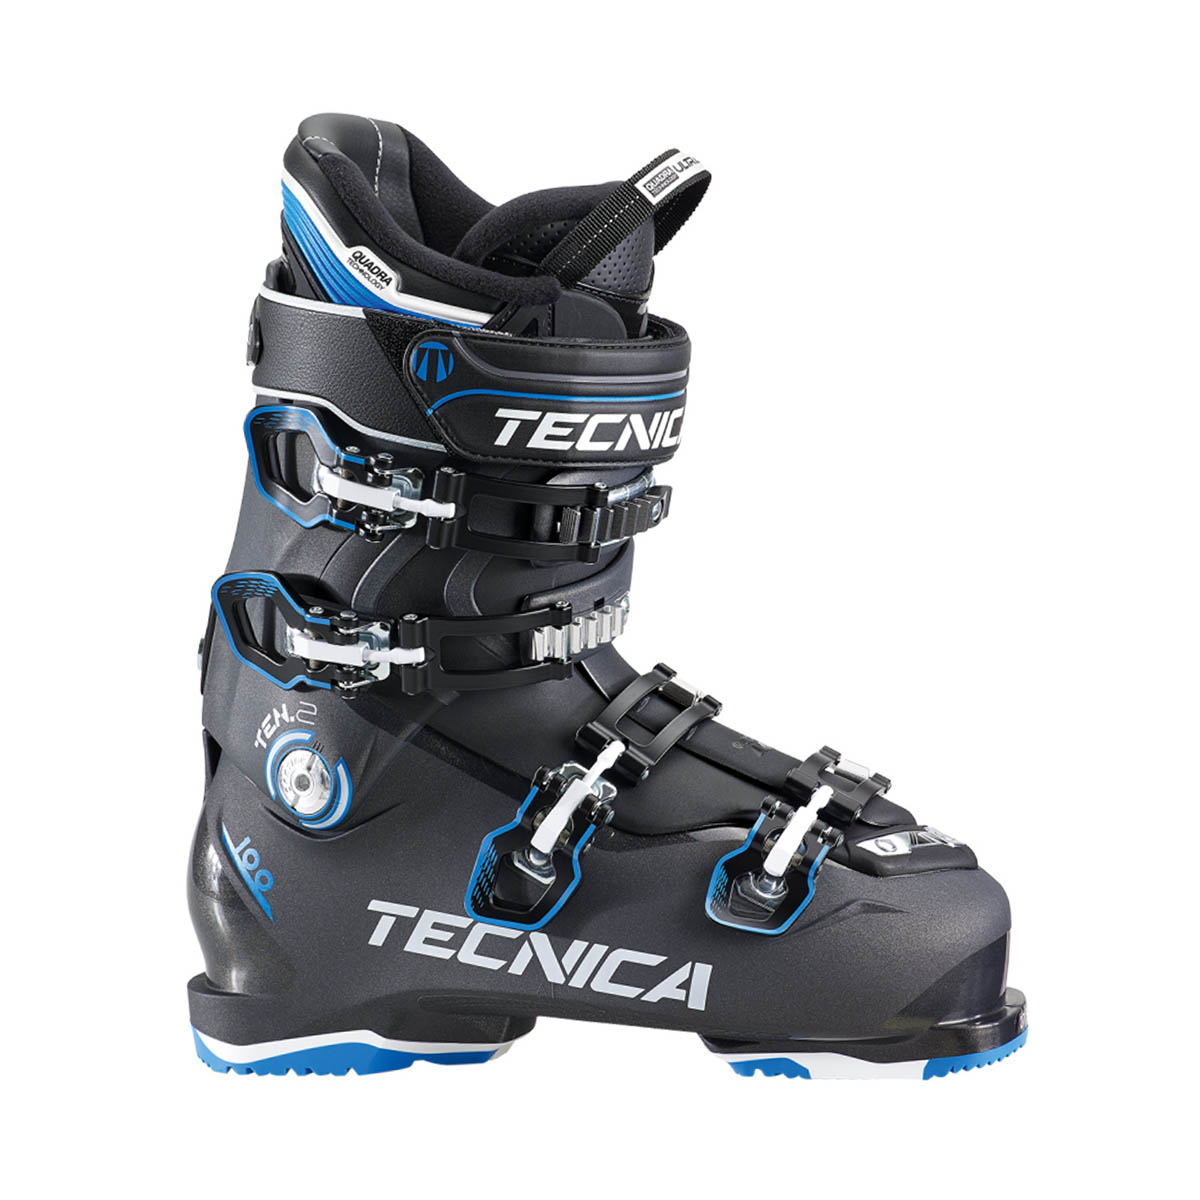 TECNICA - TEN.2 100 HVL